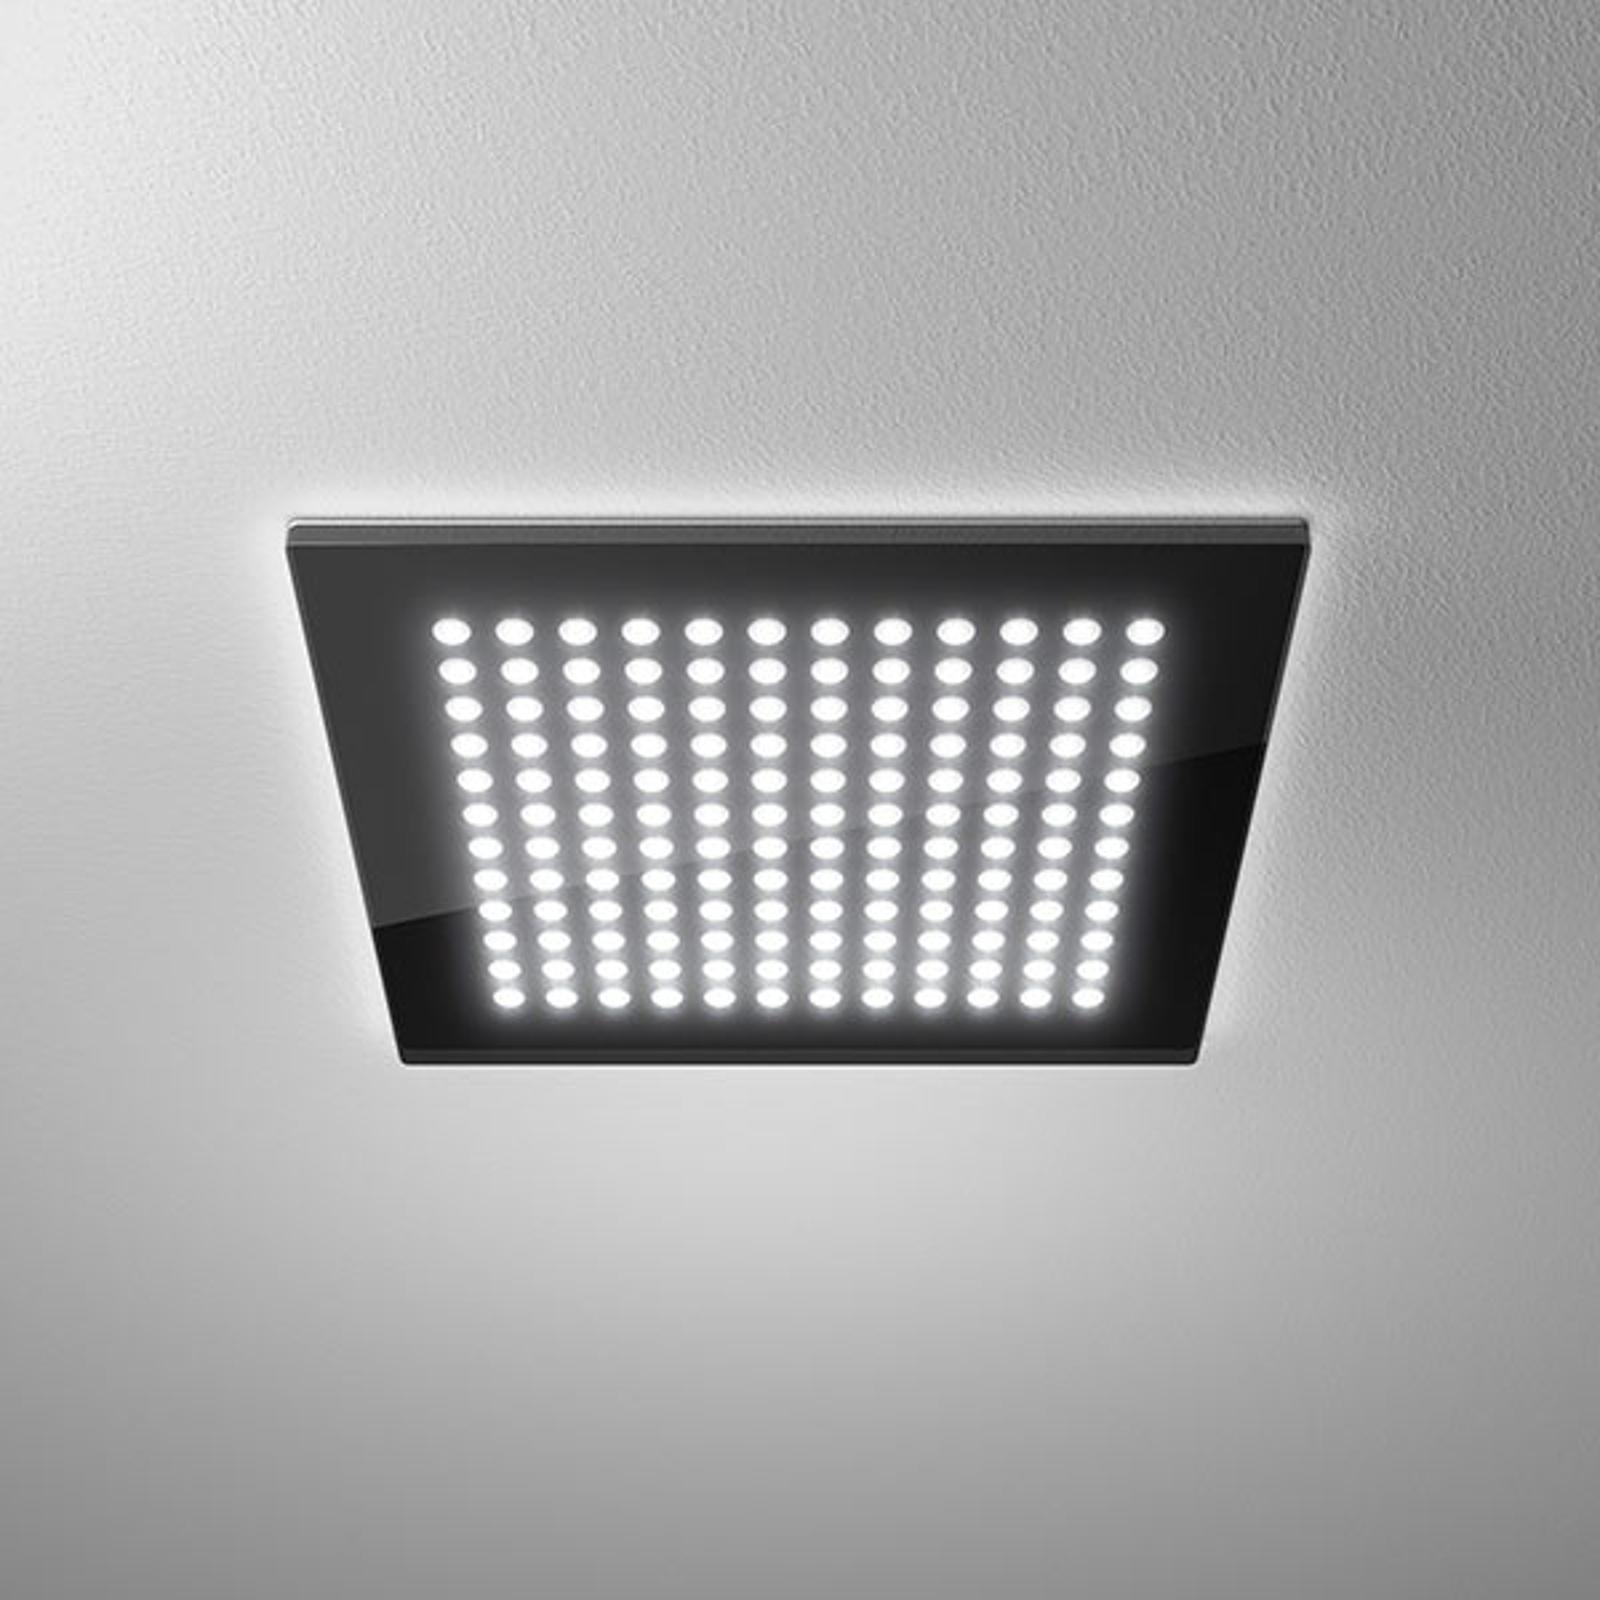 LED downlight Domino Flat Square, 26 x 26 cm, 22 W